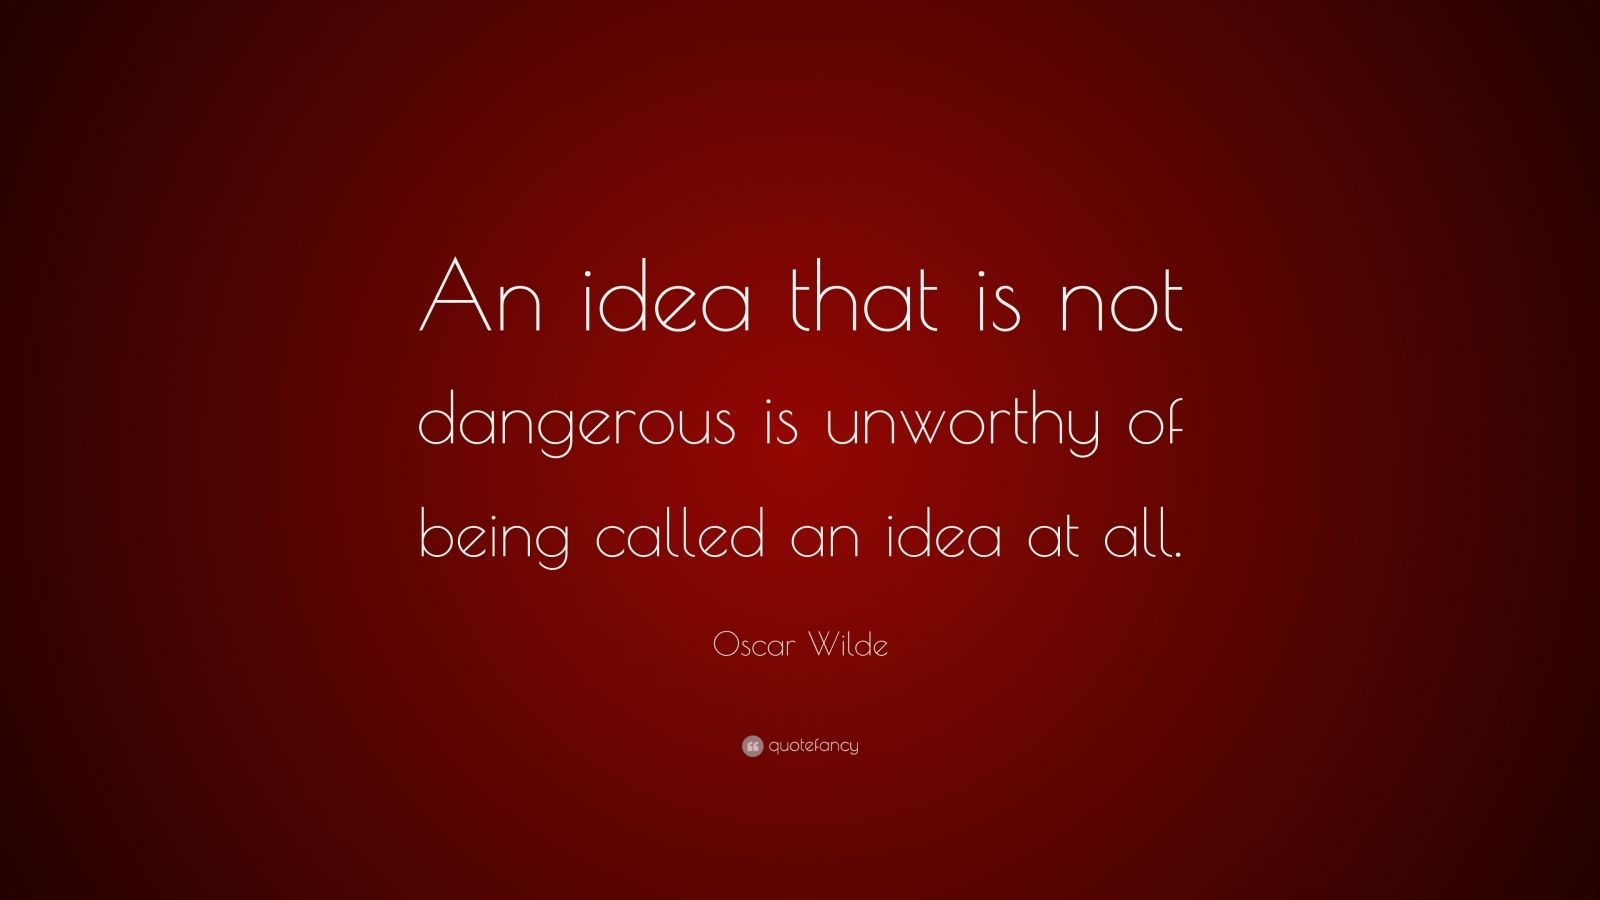 Quotes For Unworthy Friends : Oscar wilde quotes dangerous ideas quotesgram